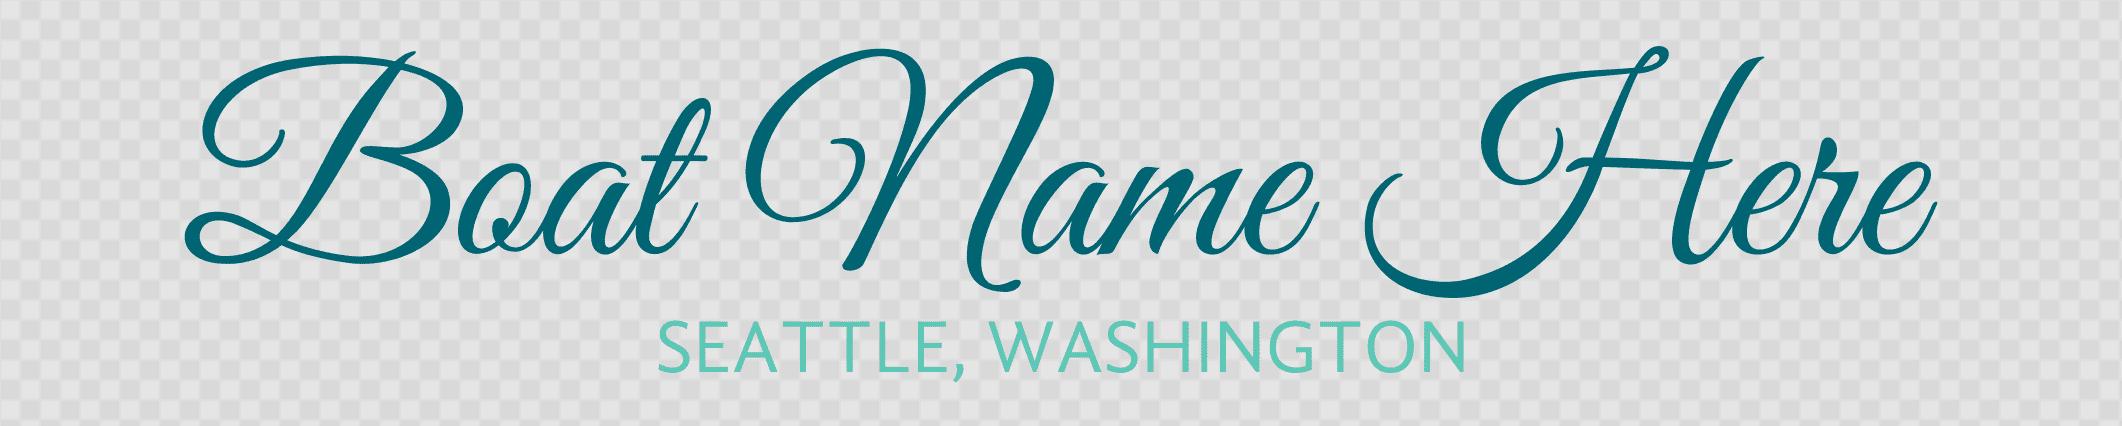 Washington hailing port template